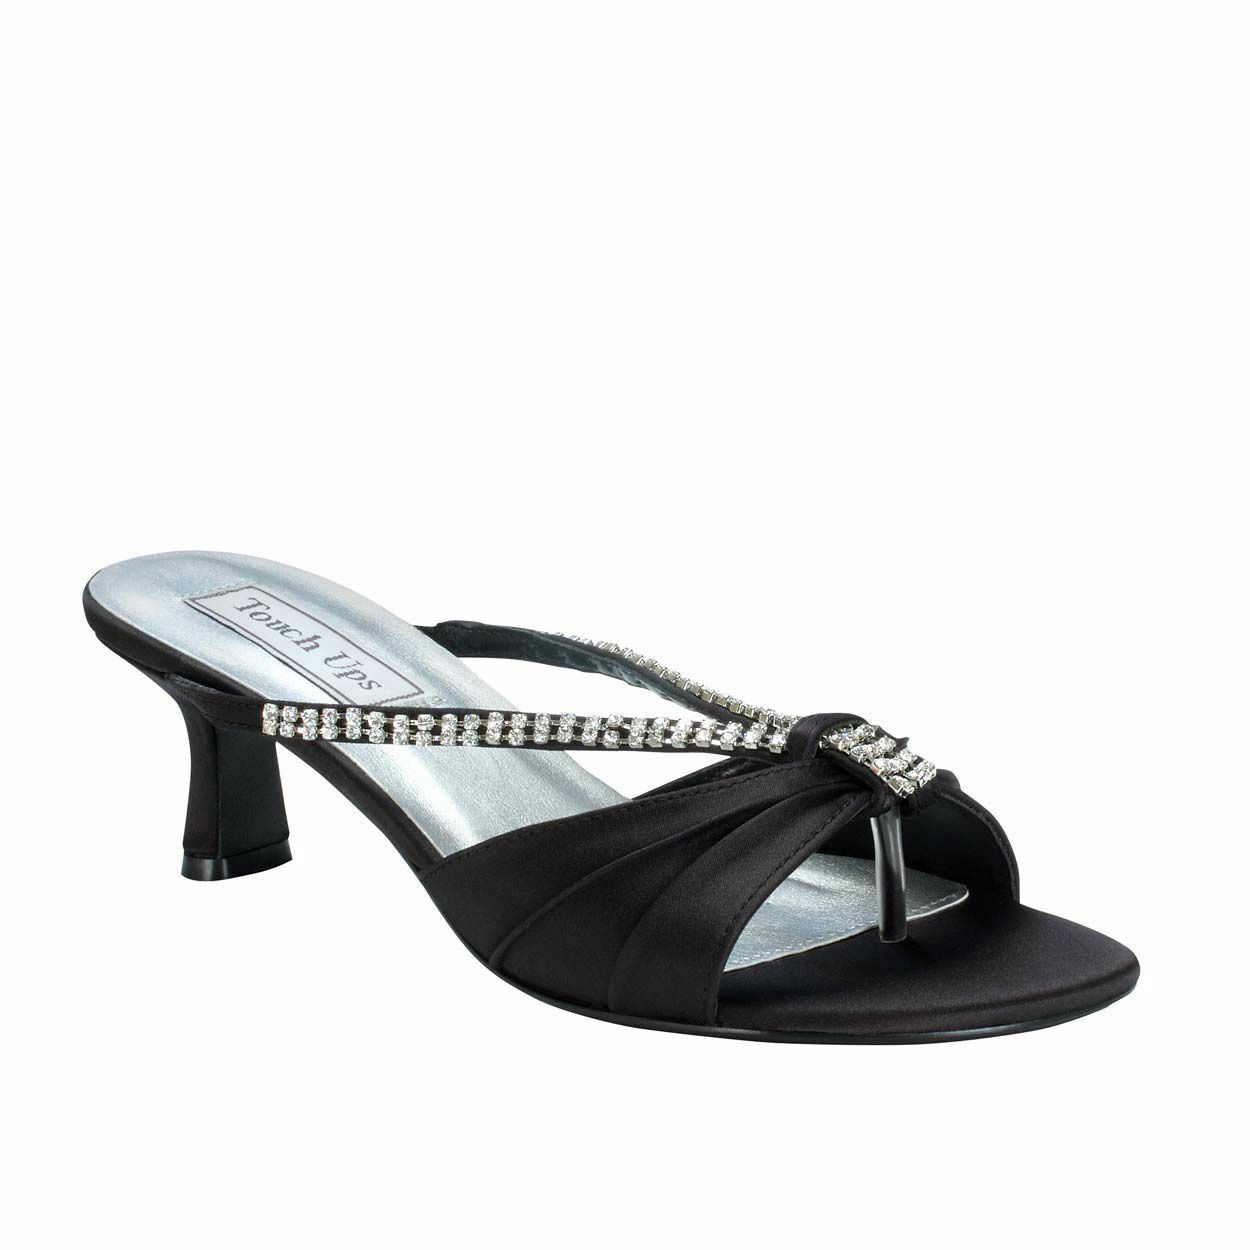 Women's Touch Ups Phoebe Low Heel Sandal Black Size Size Size 7.5  NCMVW-M98 fde955